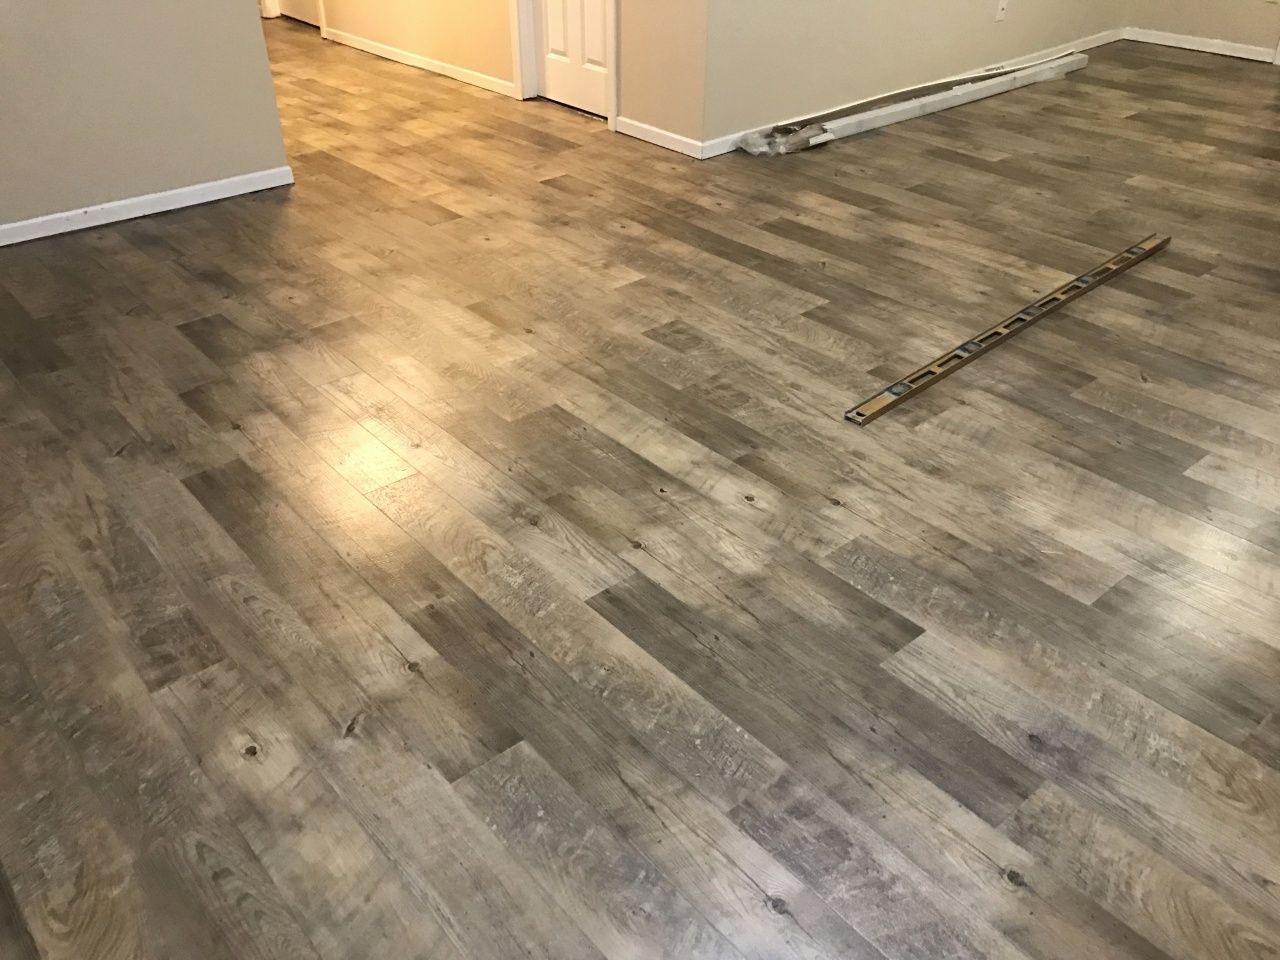 How To Stagger Vinyl Plank Flooring In 2020 Installing Vinyl Plank Flooring Luxury Vinyl Plank Vinyl Plank Flooring